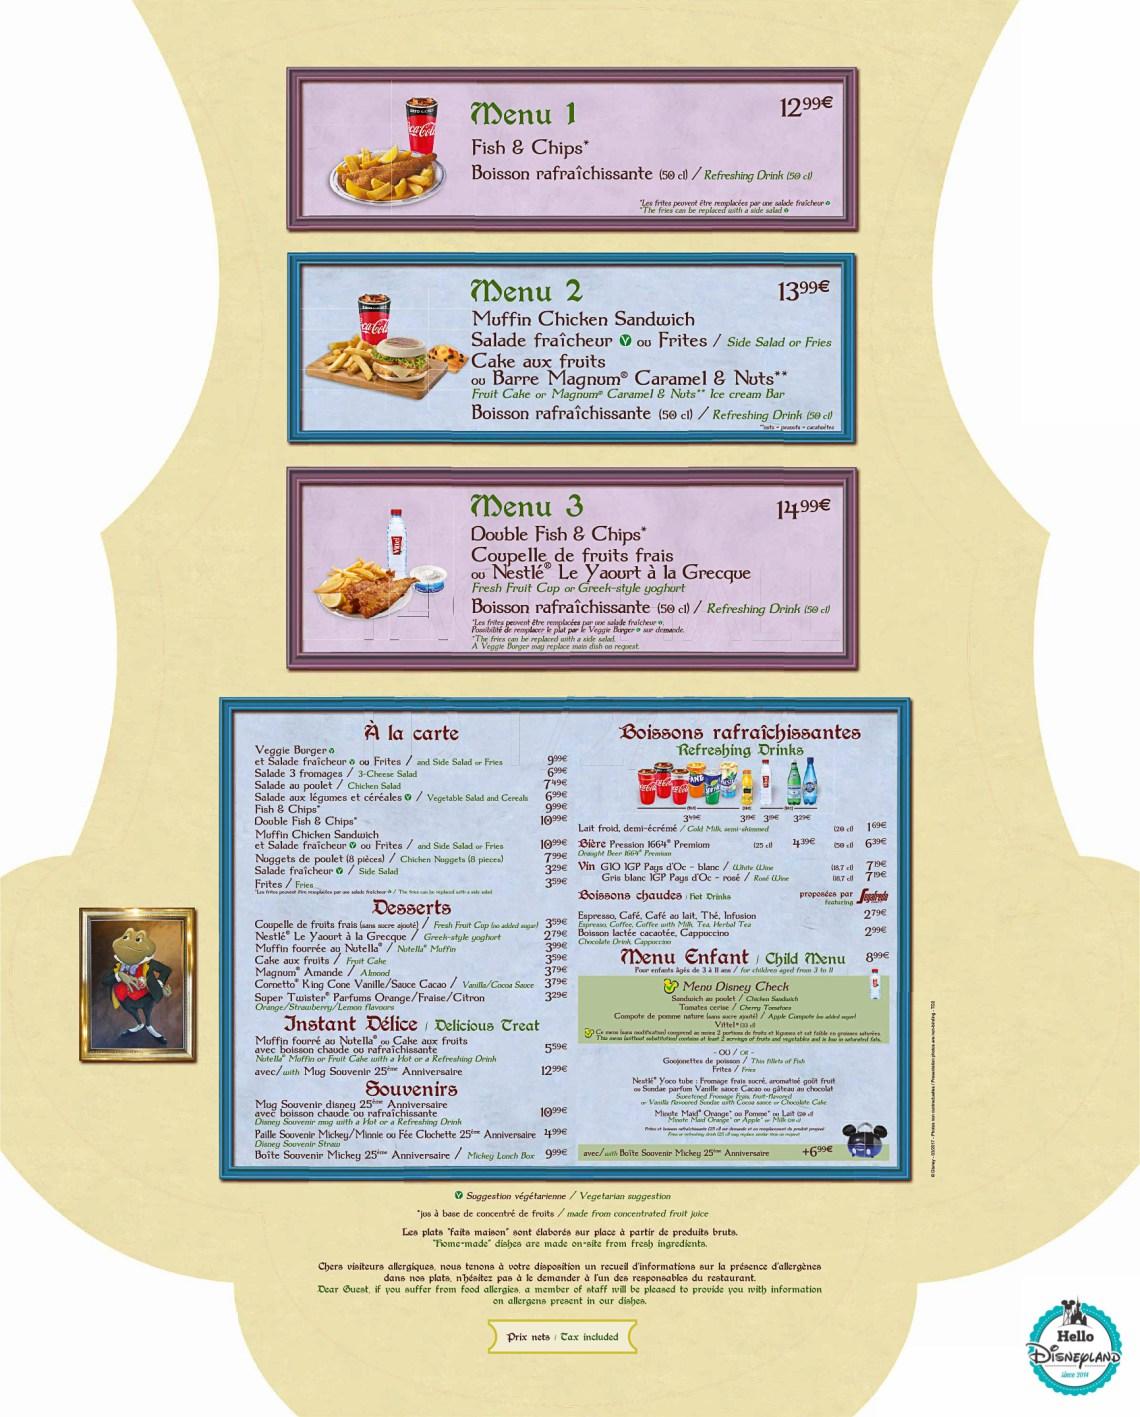 Disneyland-Paris-Restaurant-Menus-2017-Toad-Hall-1